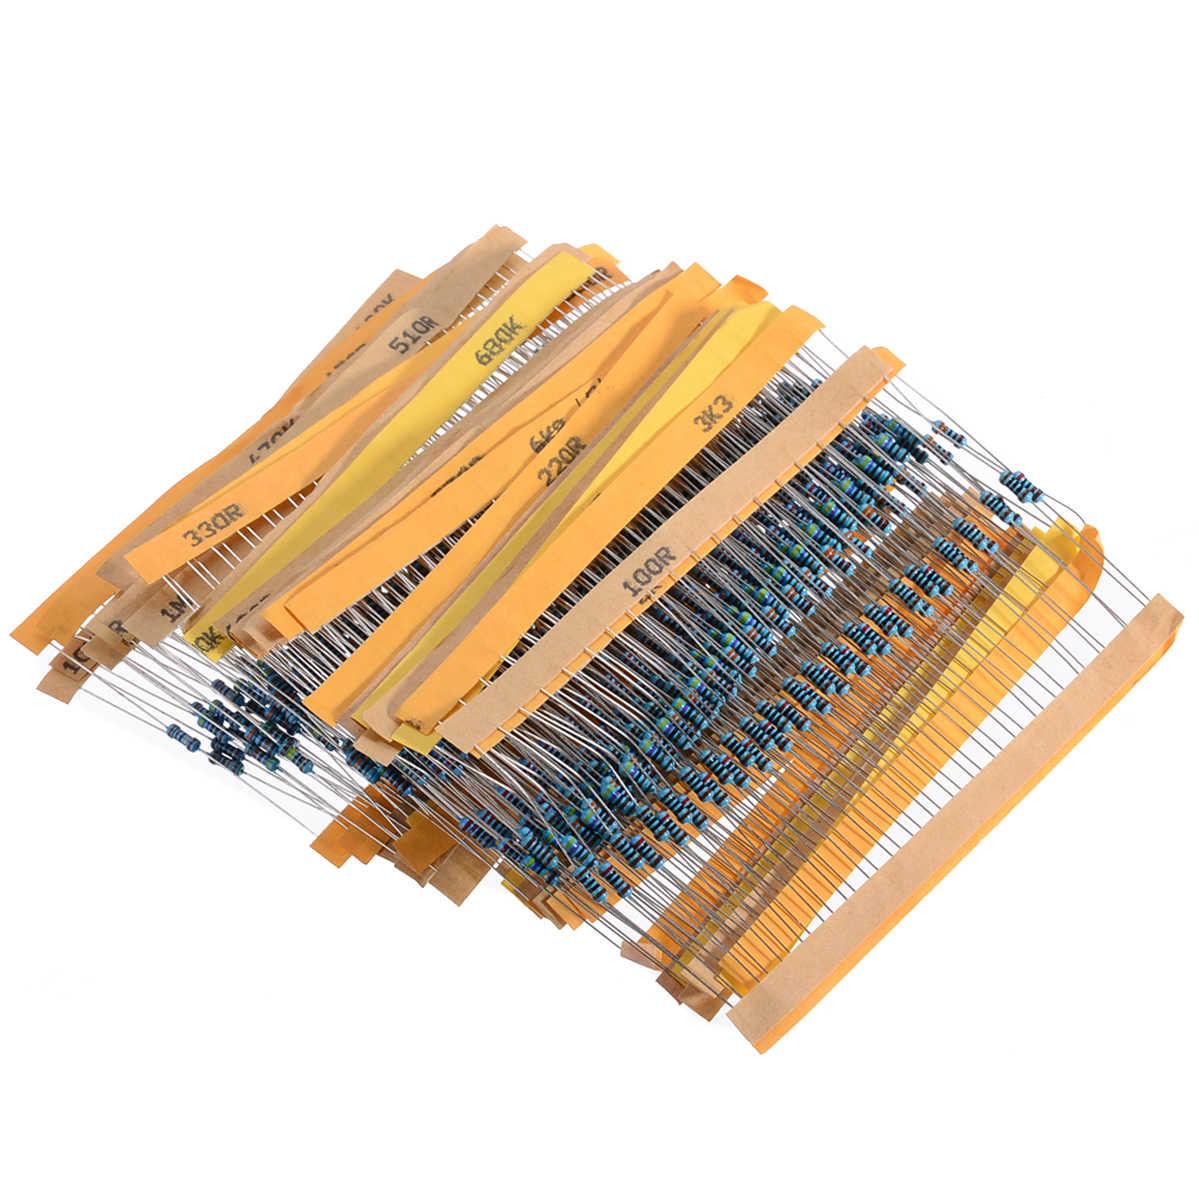 US 600Pcs 30 Values 1//4W Metal Resistors Resistance Assortment Kit 1/% Accuracy